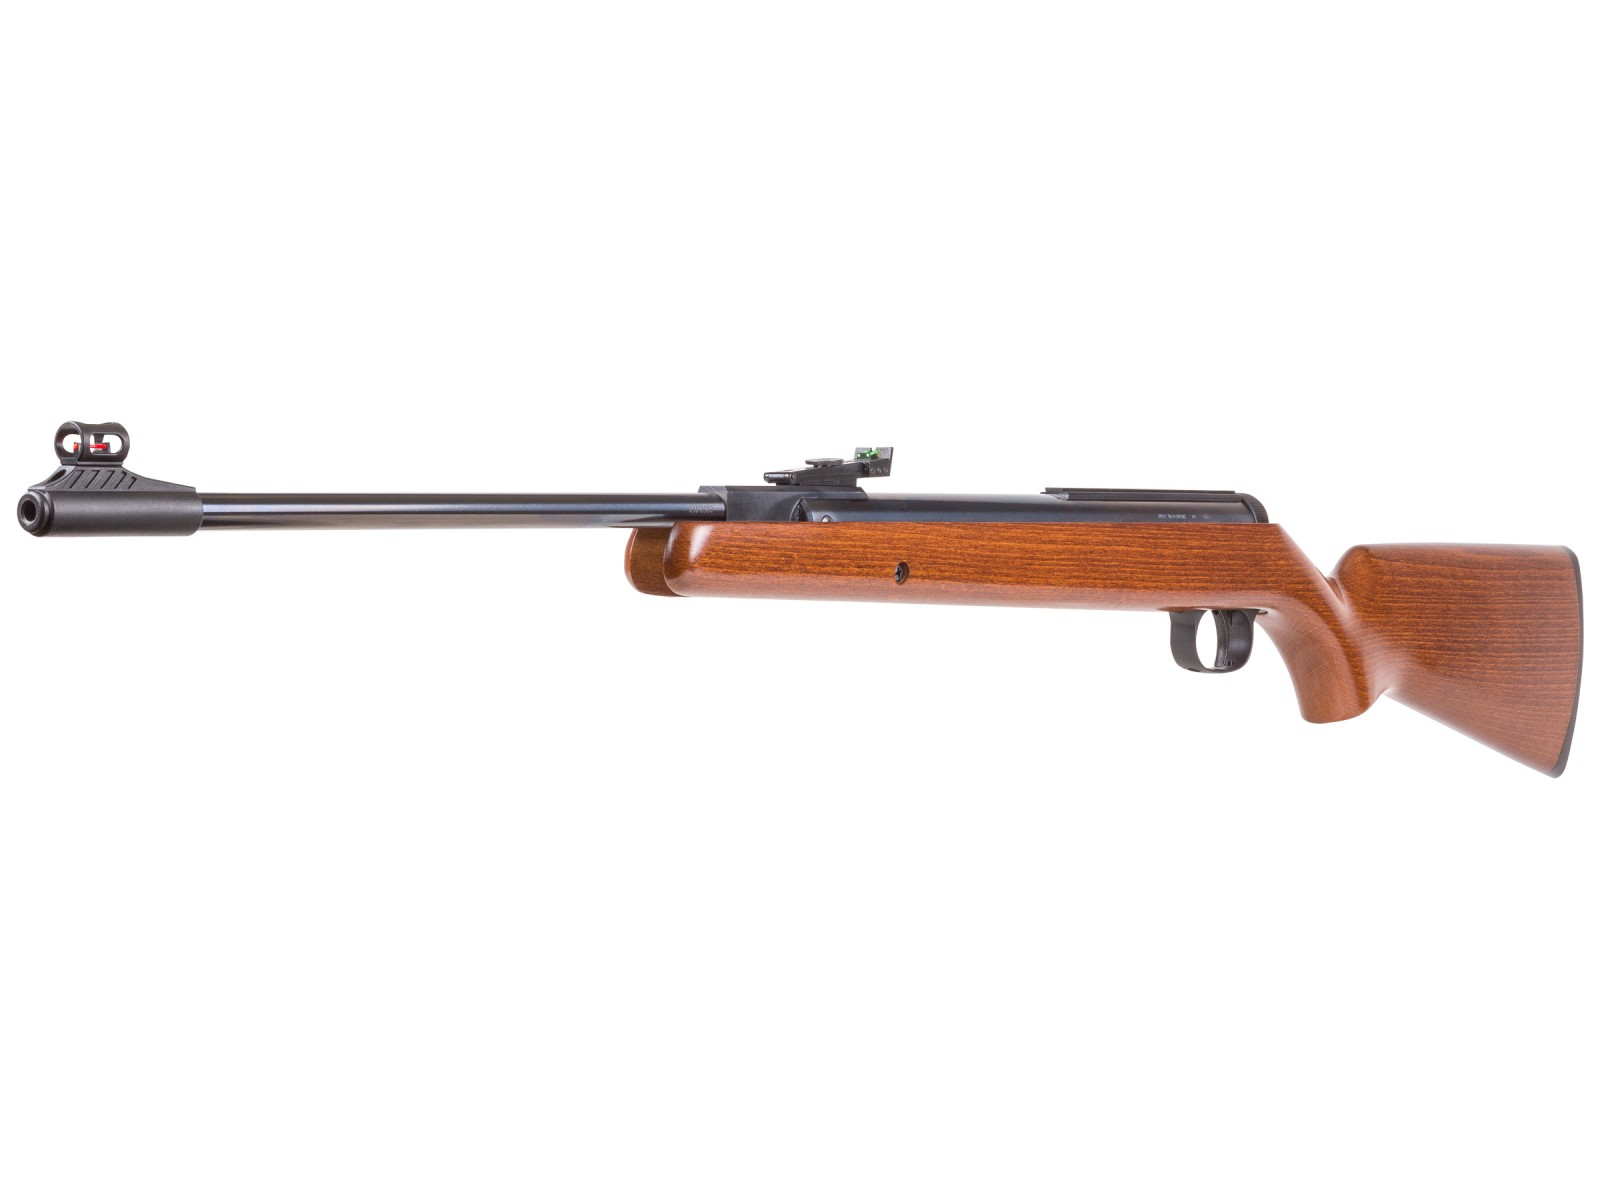 Diana RWS 34 Breakbarrel Rifle, T06 Trigger 0.177 Image